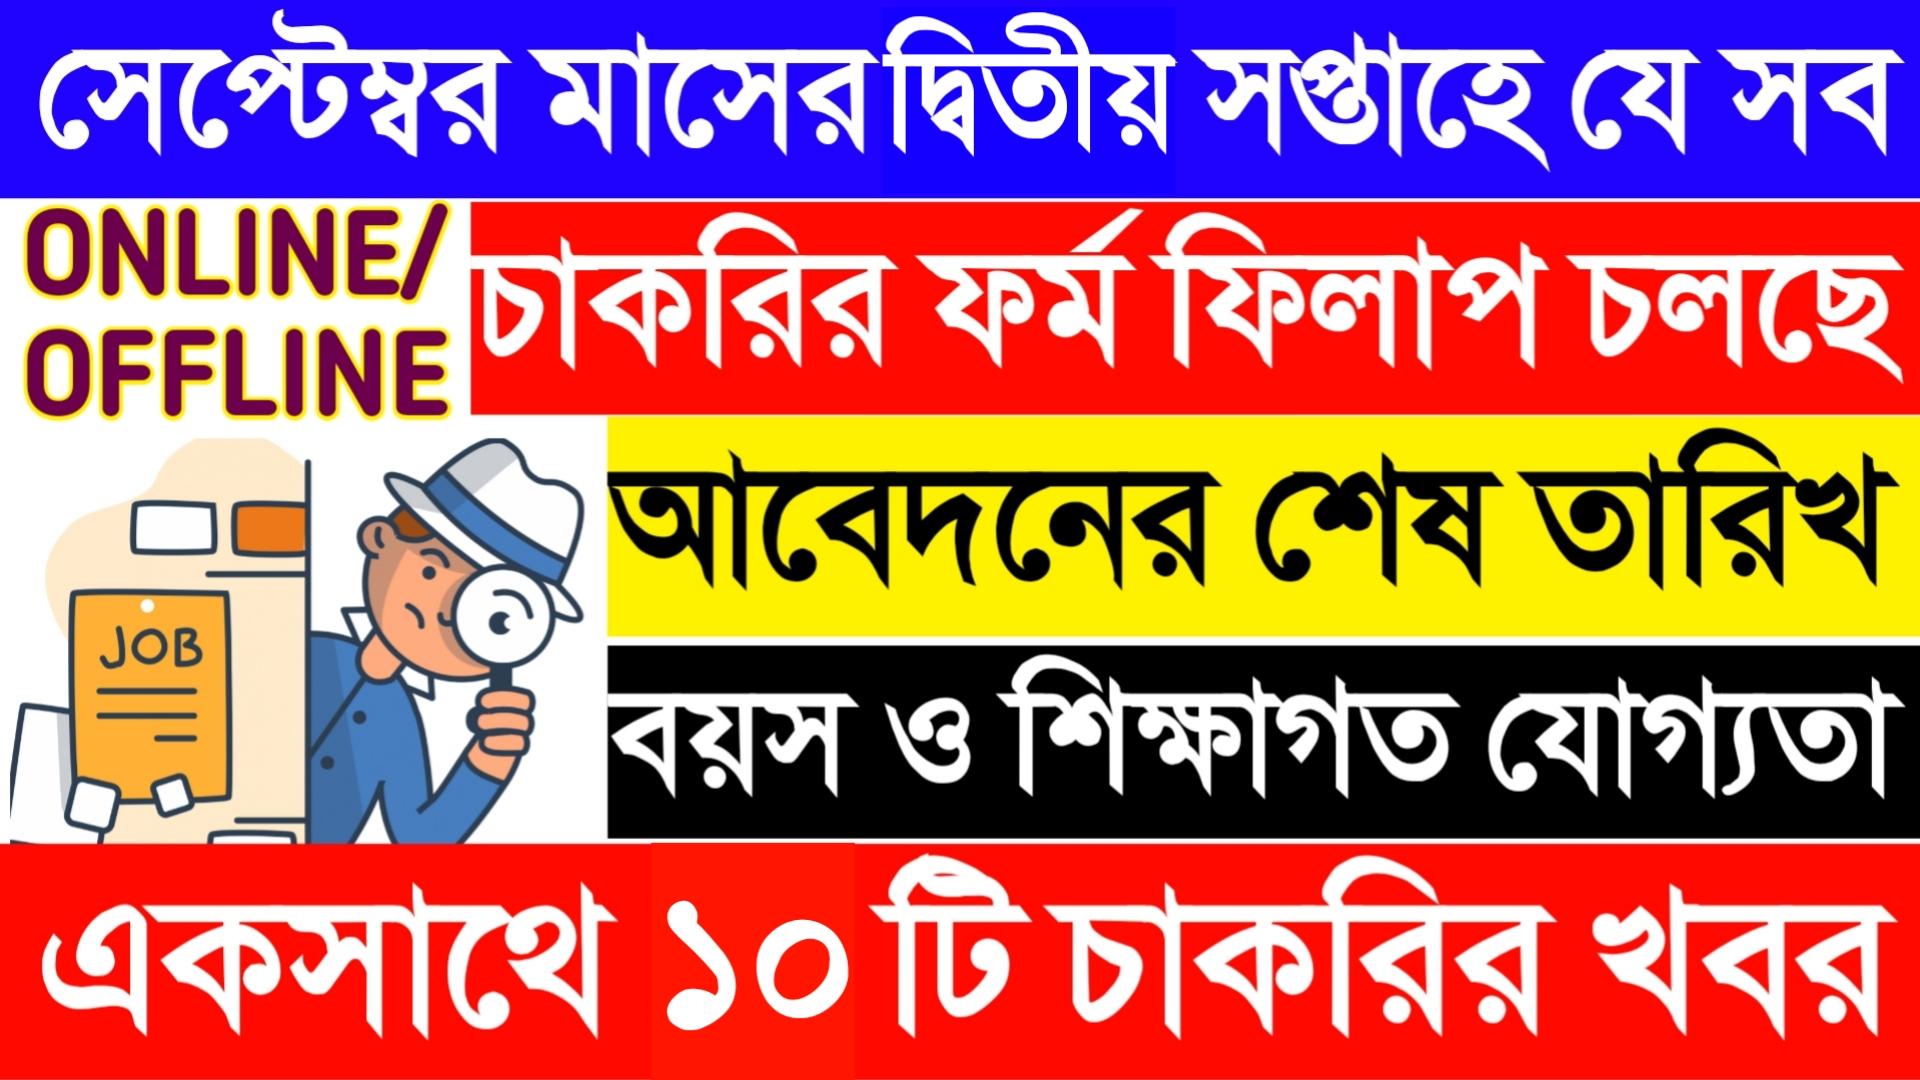 September 2nd Week Govt Job News 2020 || September 2nd Week West Bengal Govt Job News 2020 ||